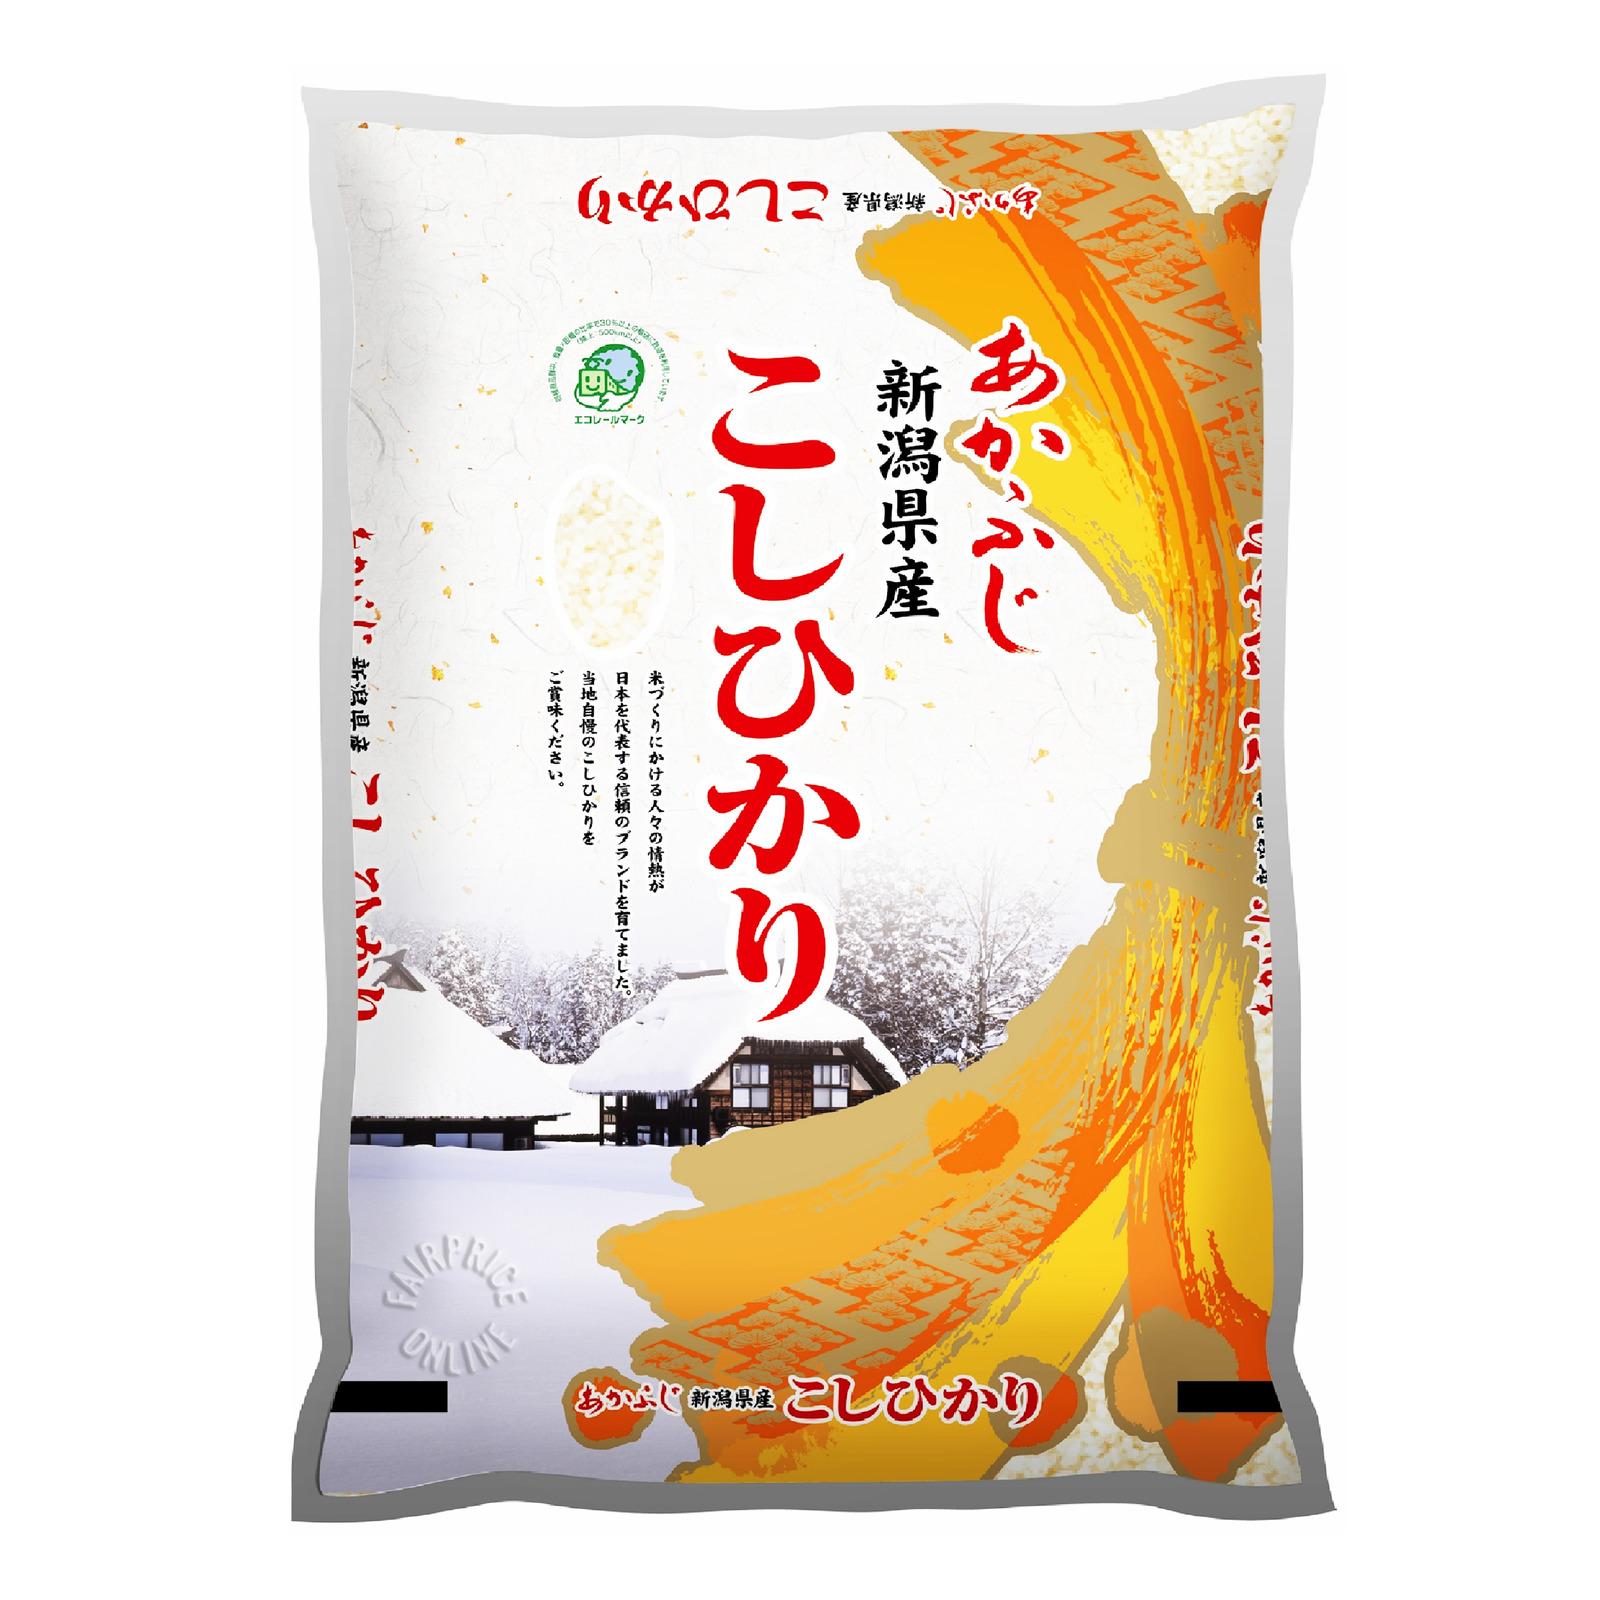 Shinmei Koshihikari Japanese Rice - Niigata